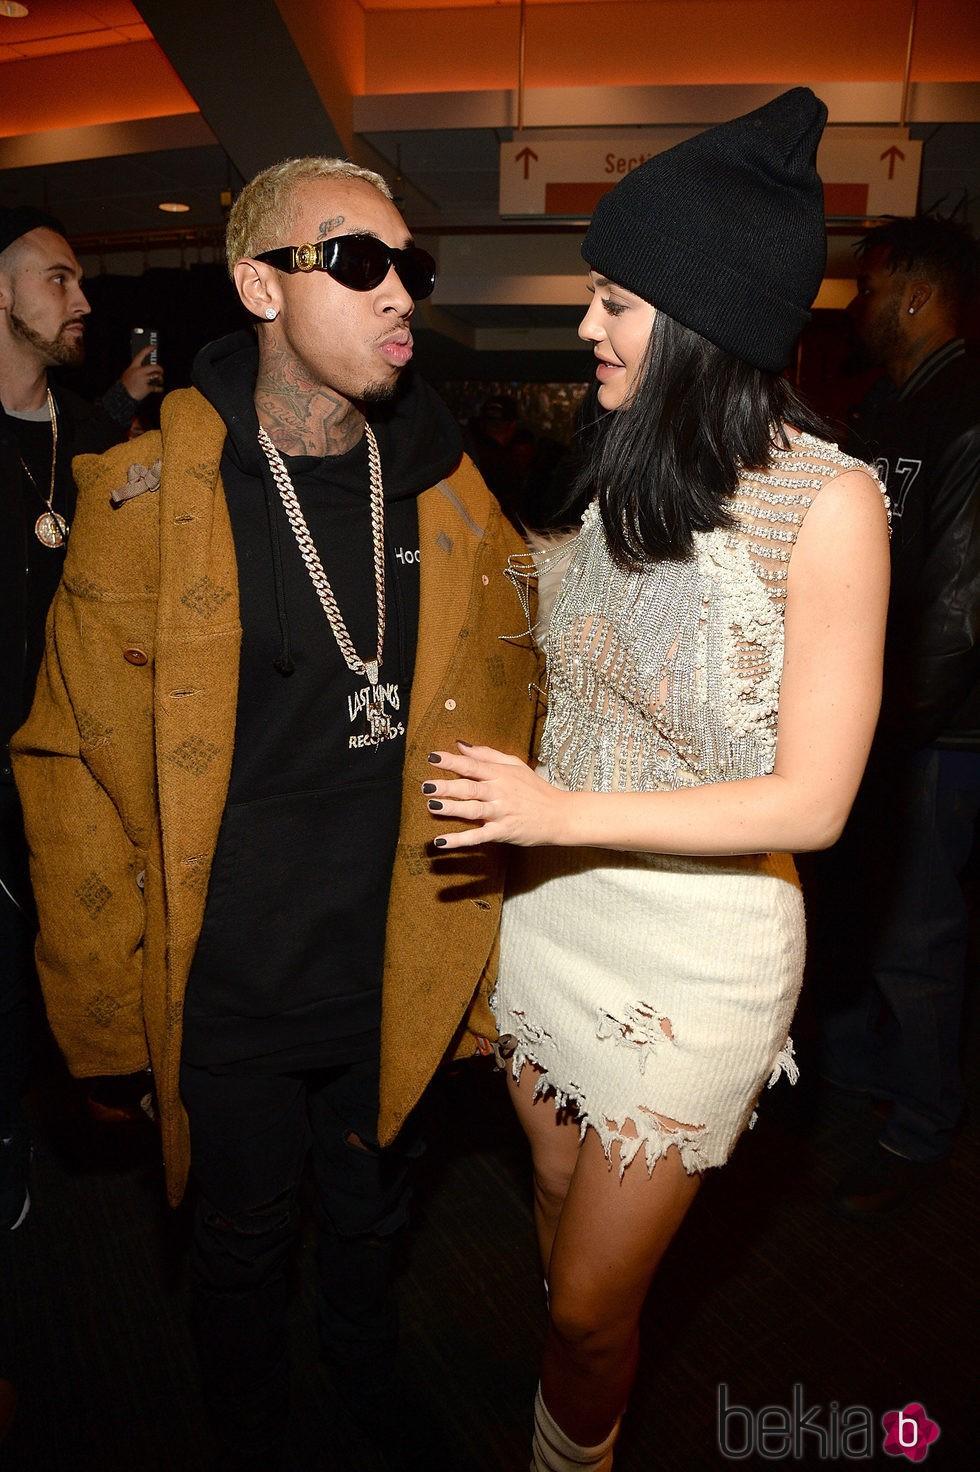 Tyga y Kylie Jenner en el desfile de Kanye West 'Yeezy Season 3'